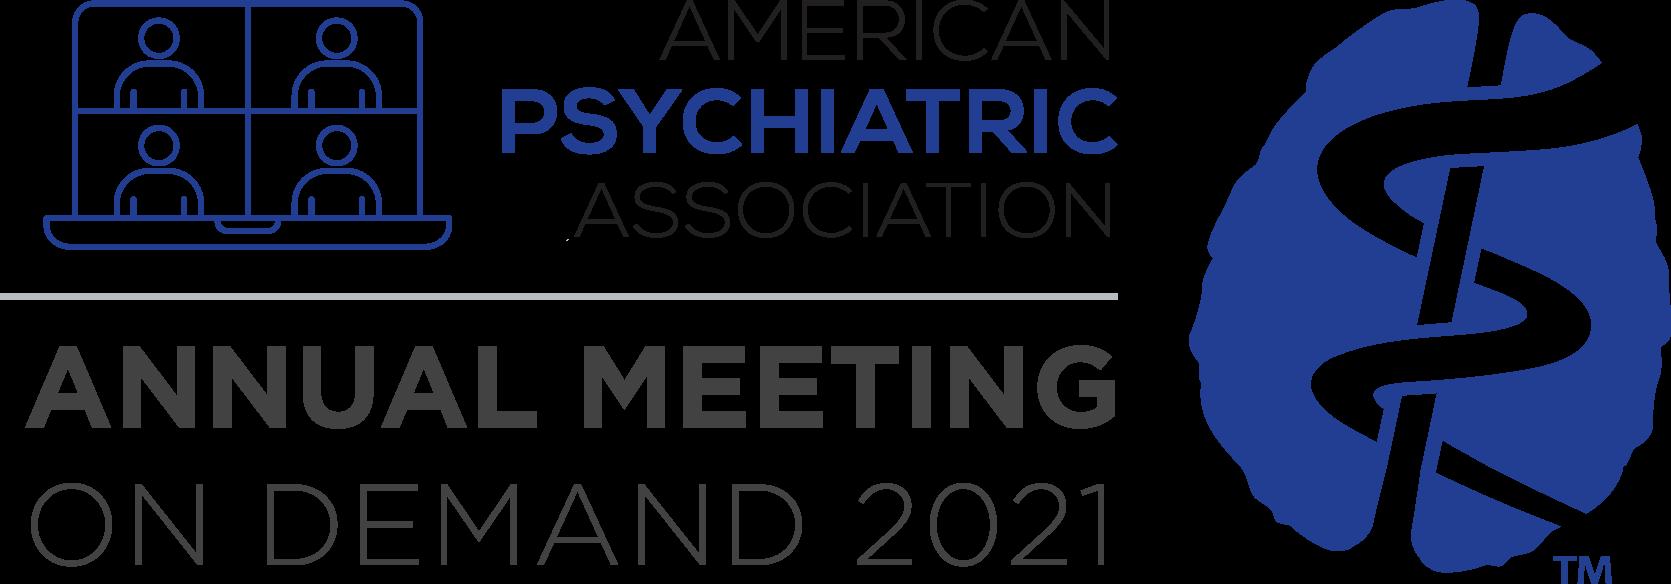 American Psychiatric Association Annual Meeting On Demand 2020